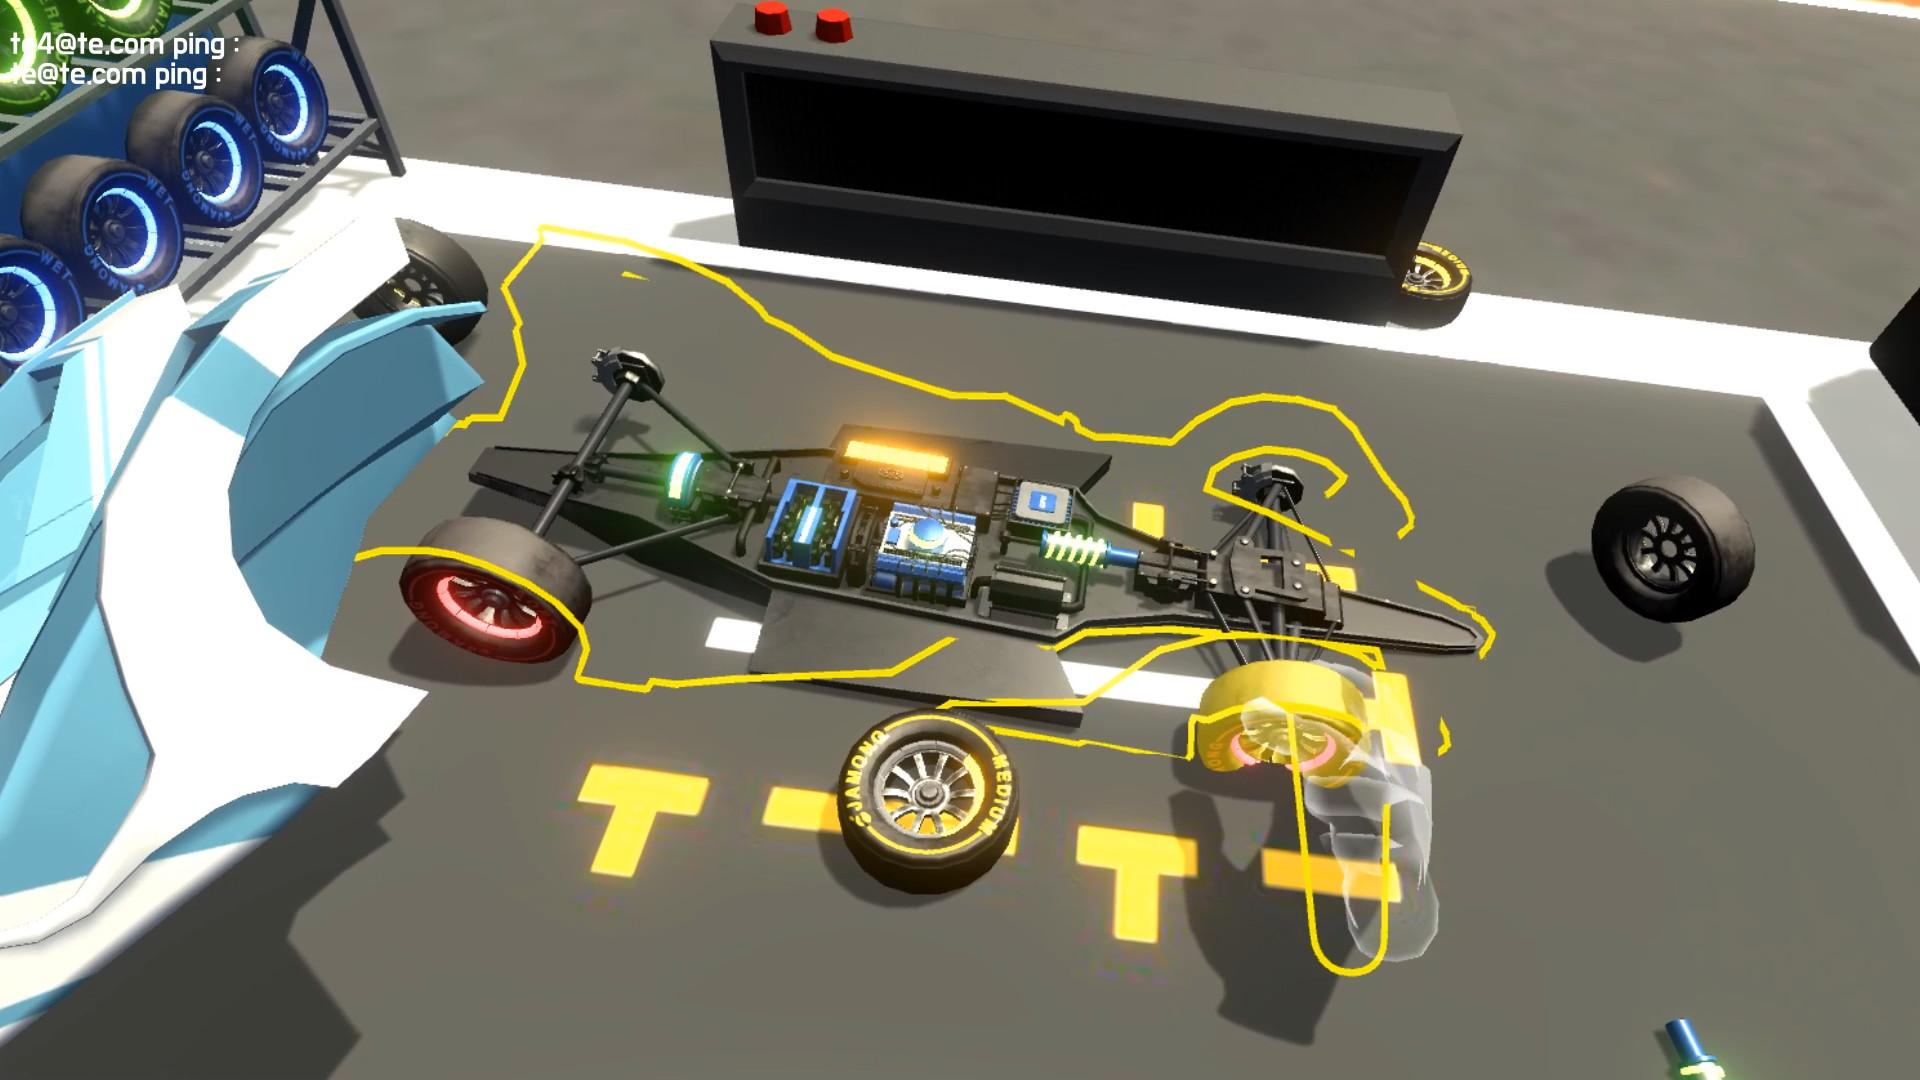 What's On Steam - POCKET CAR : VRGROUND